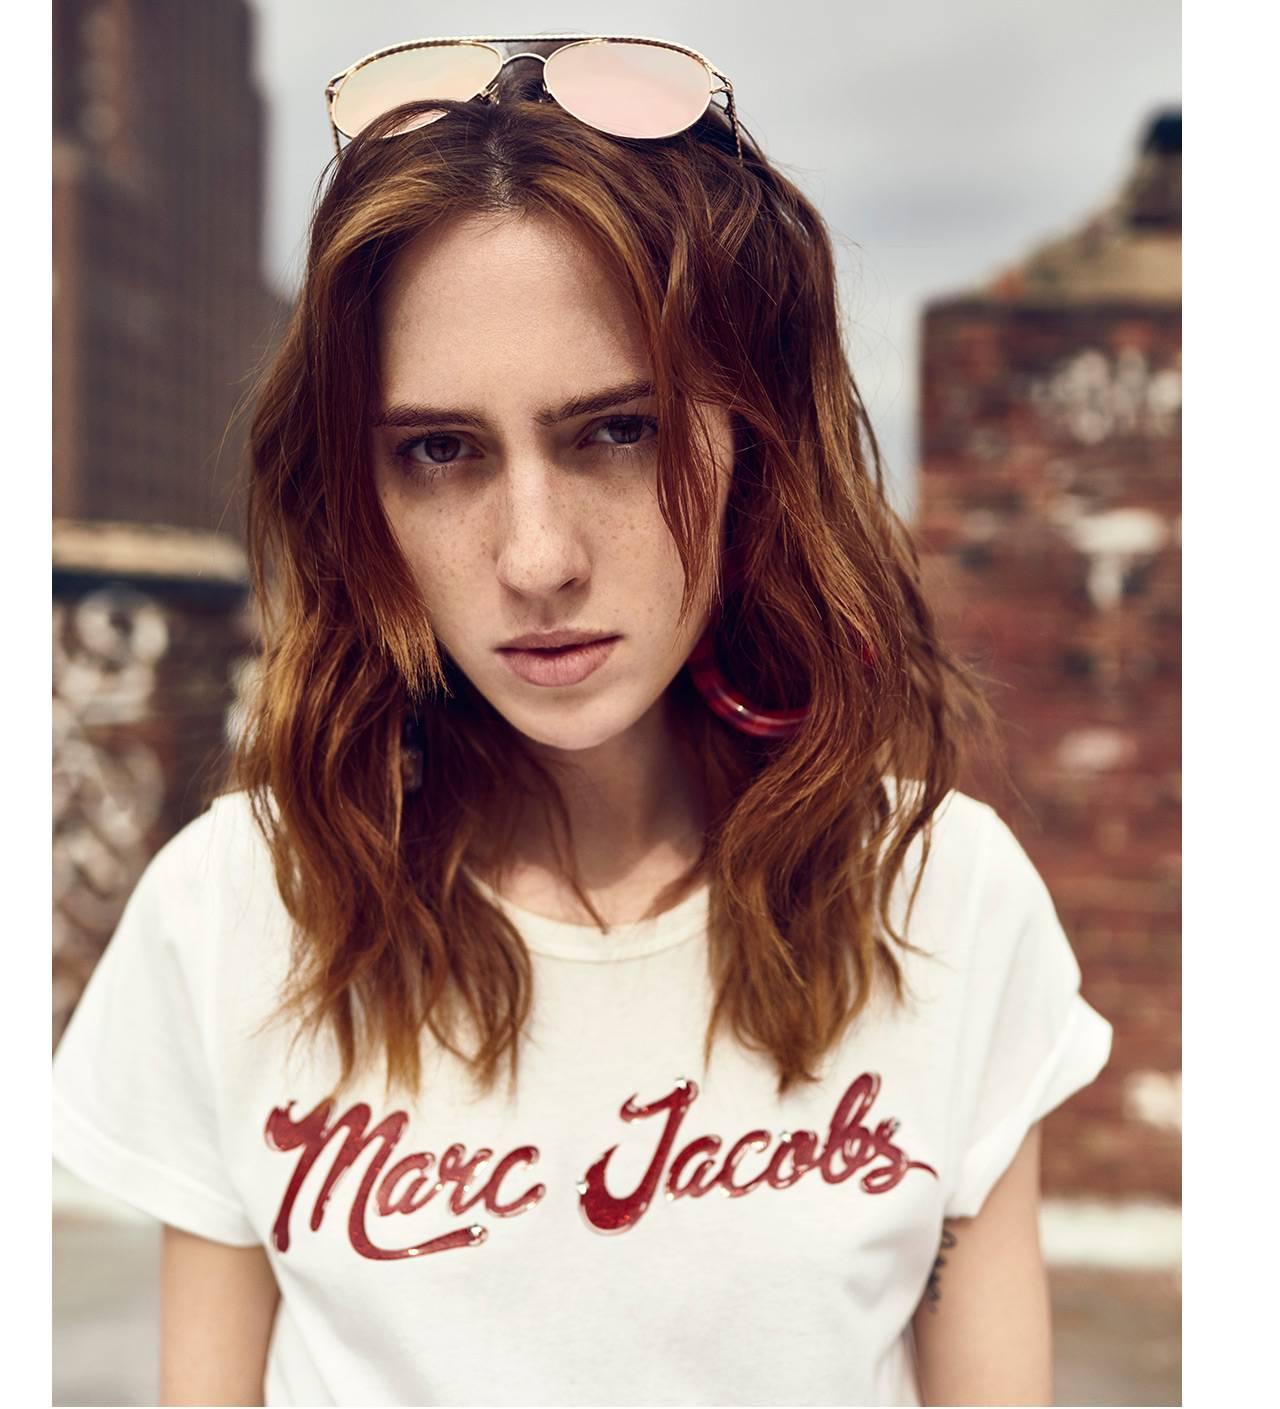 Hair accessories singapore - Shop Marc Jacobs Clothing